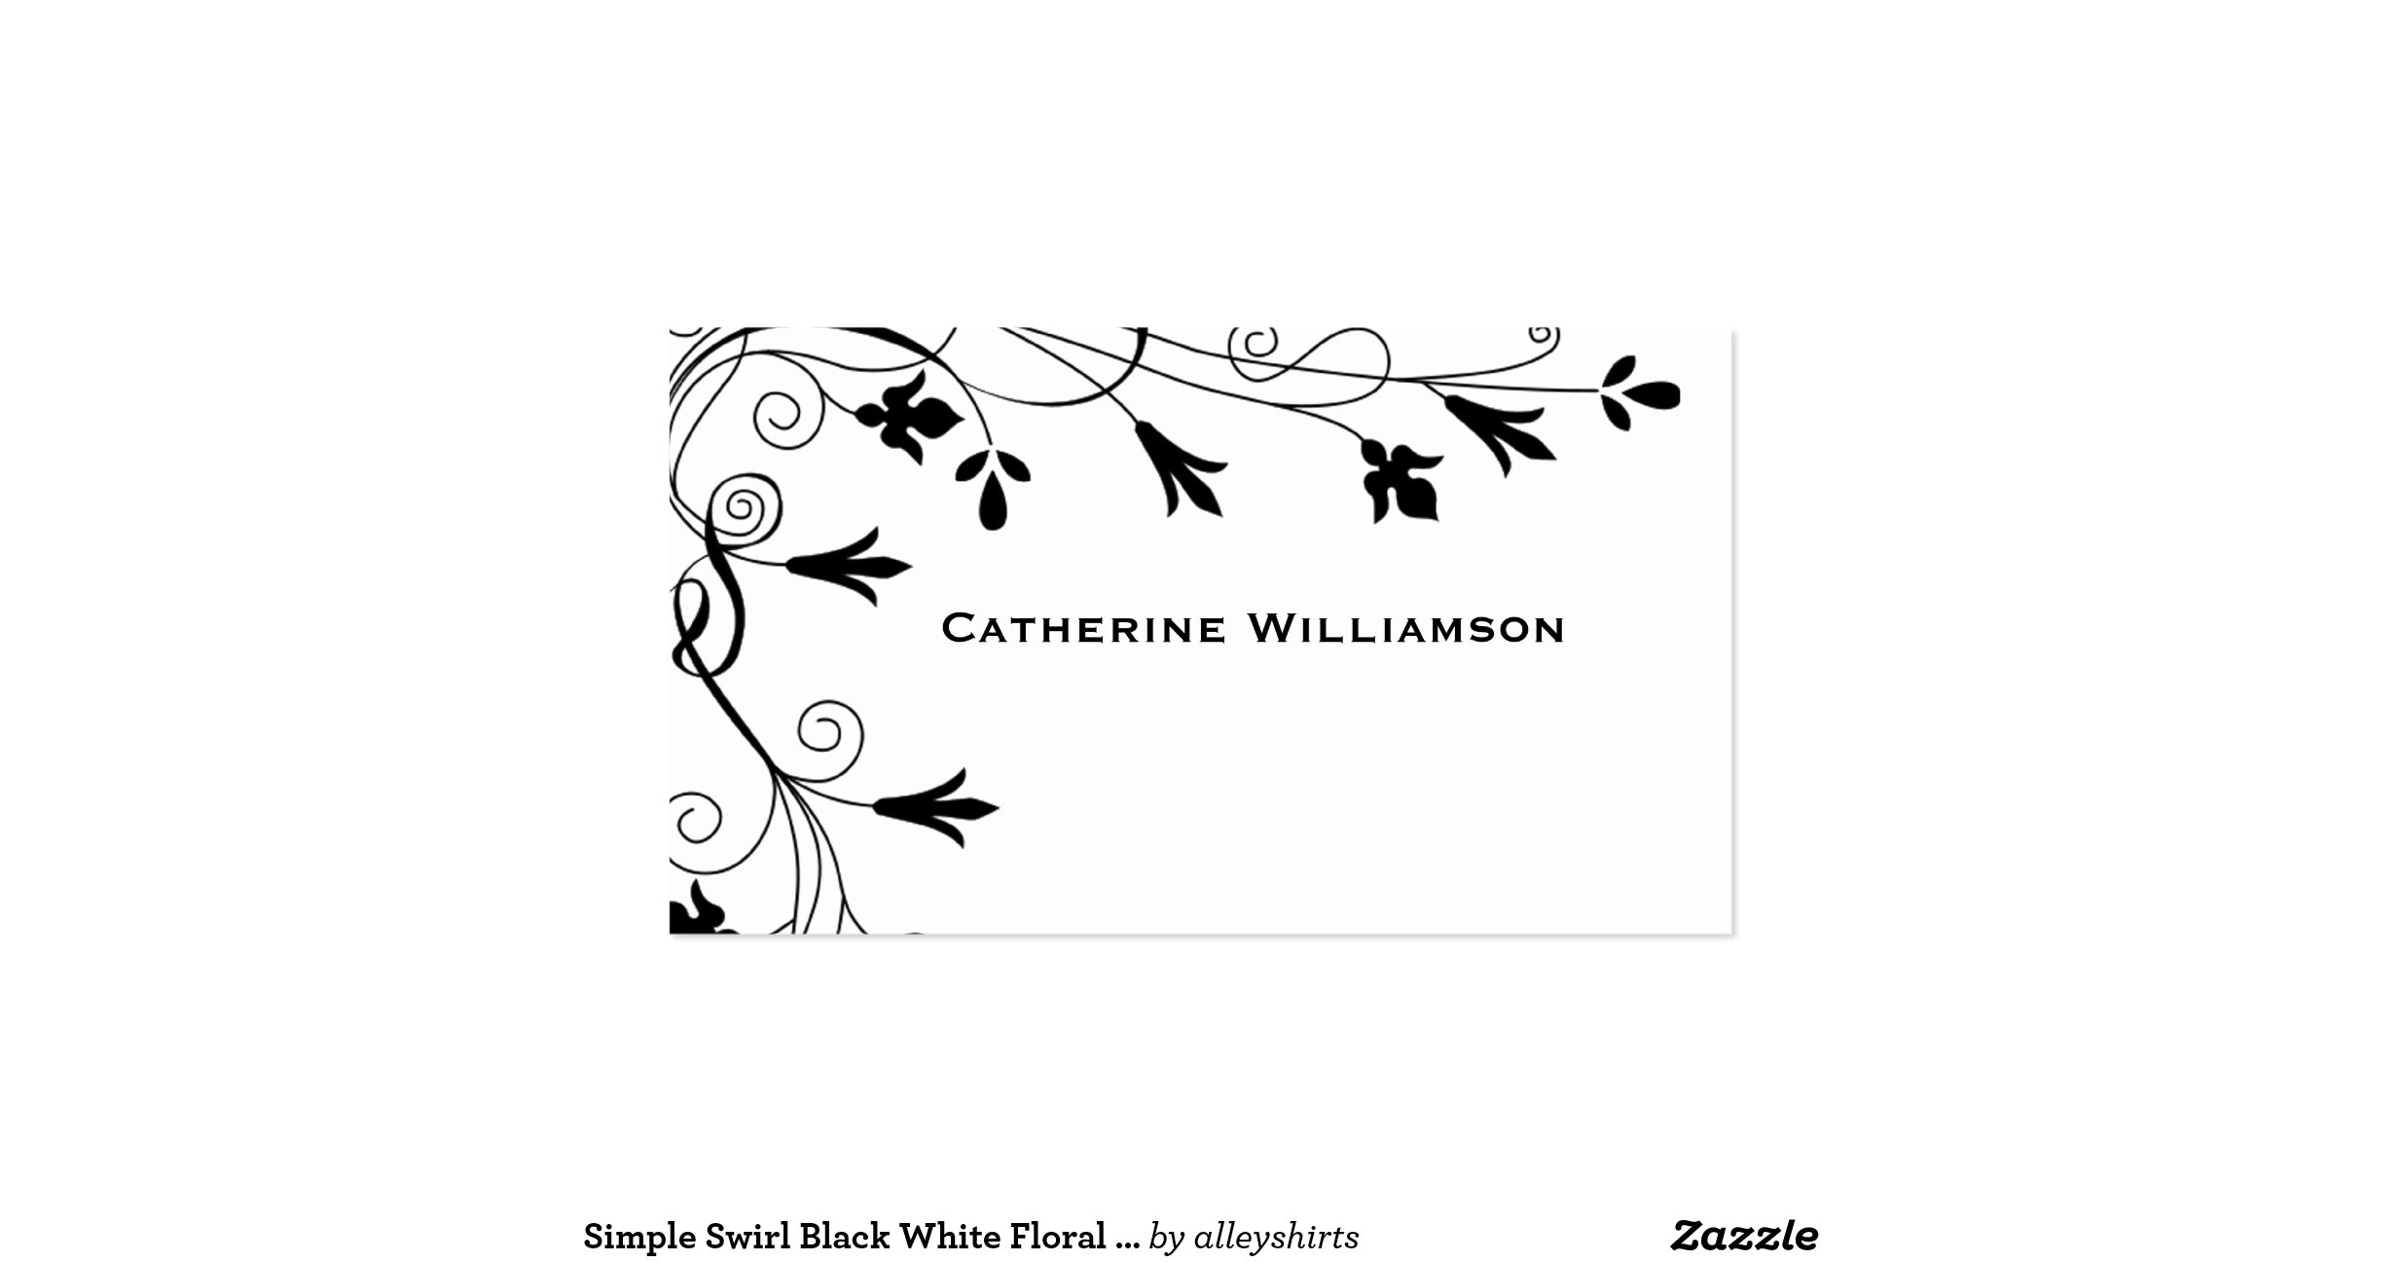 simple swirl black white floral vine border doublesided